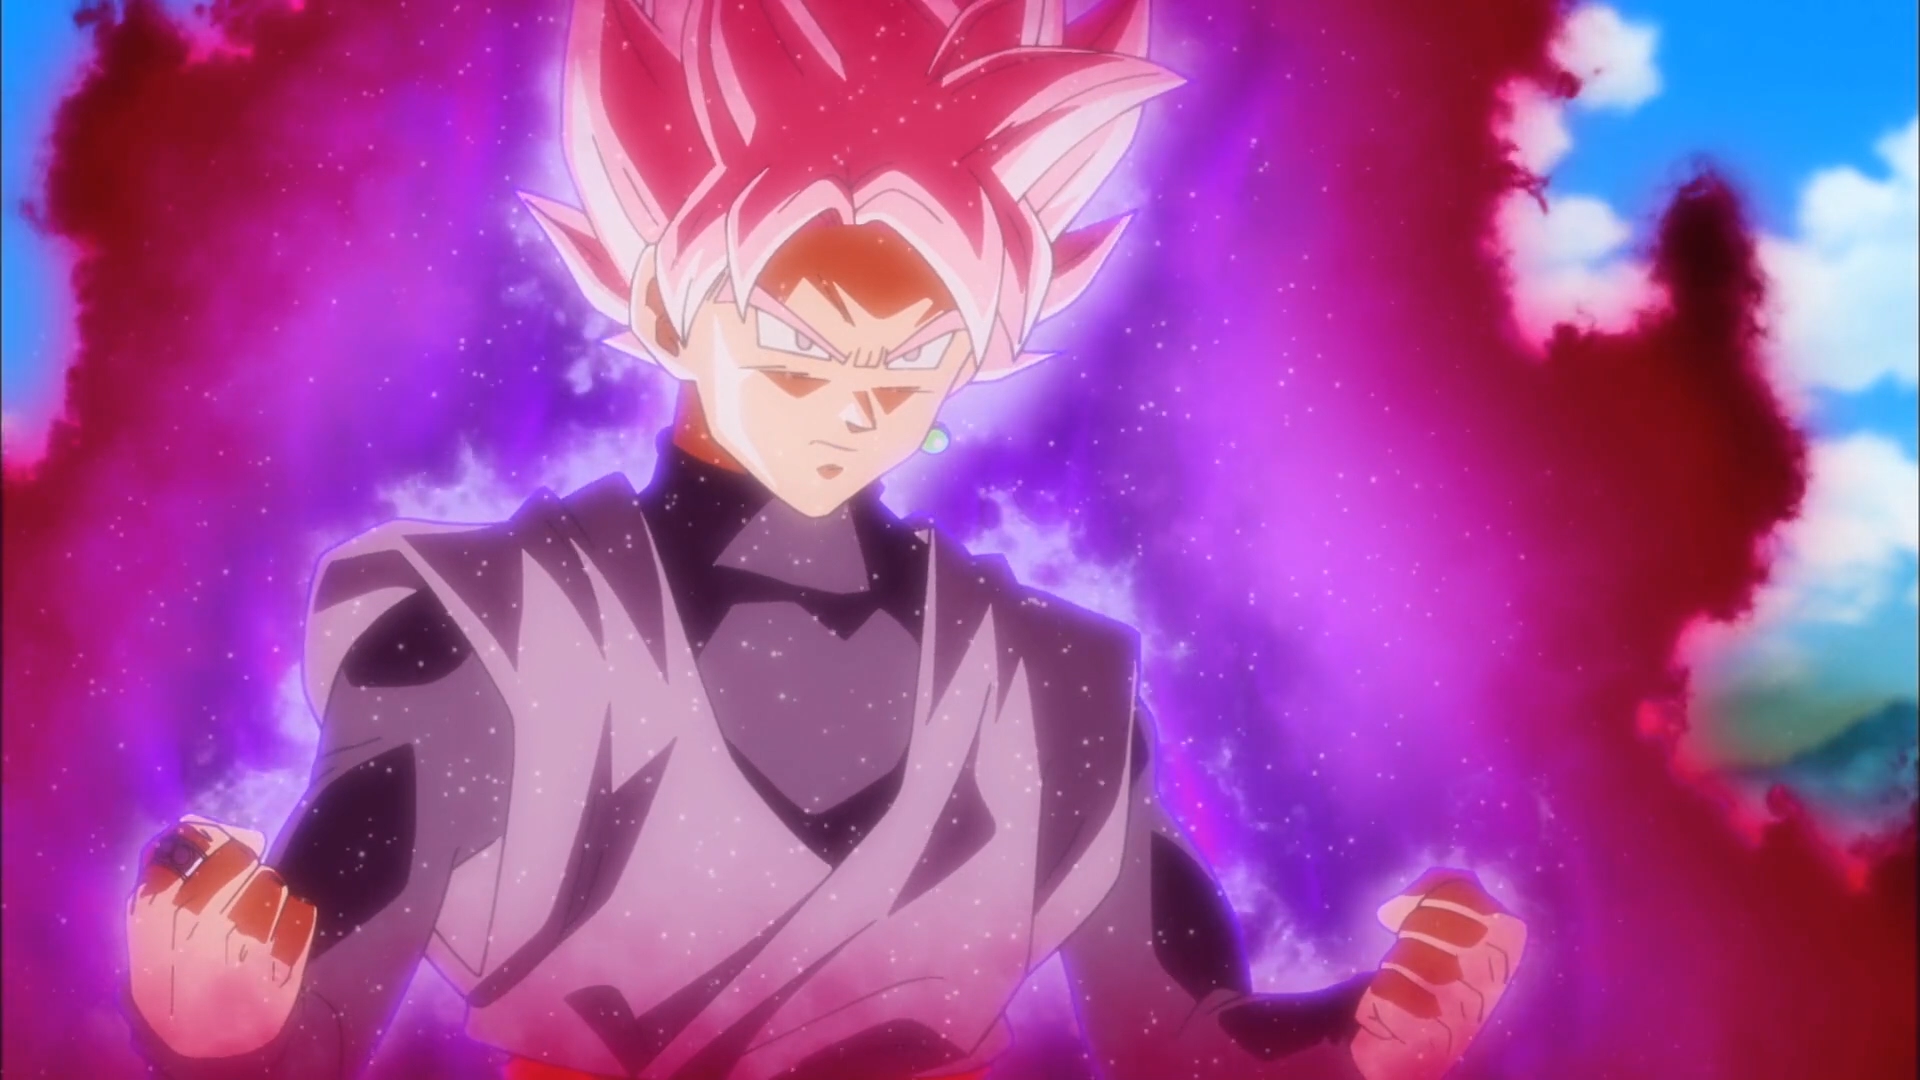 Steam Workshop Goku Black Super Saiyan Rose 1080p